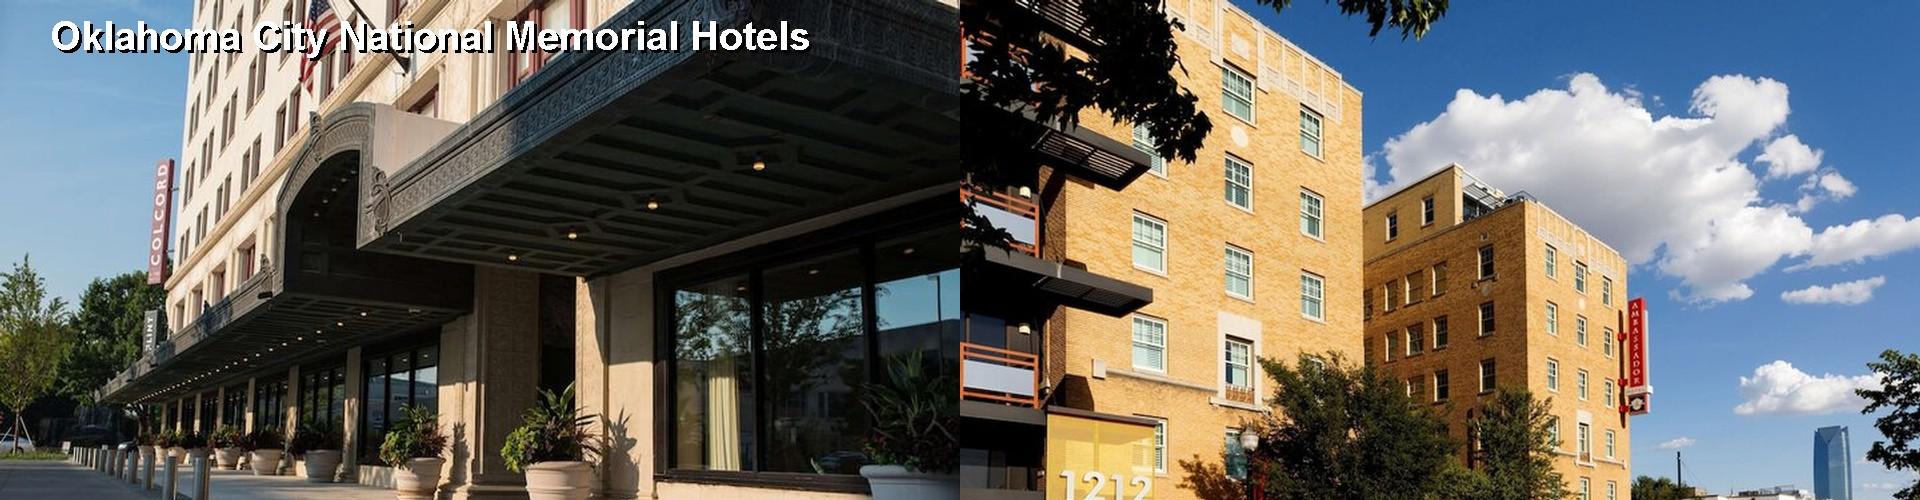 5 Best Hotels Near Oklahoma City National Memorial